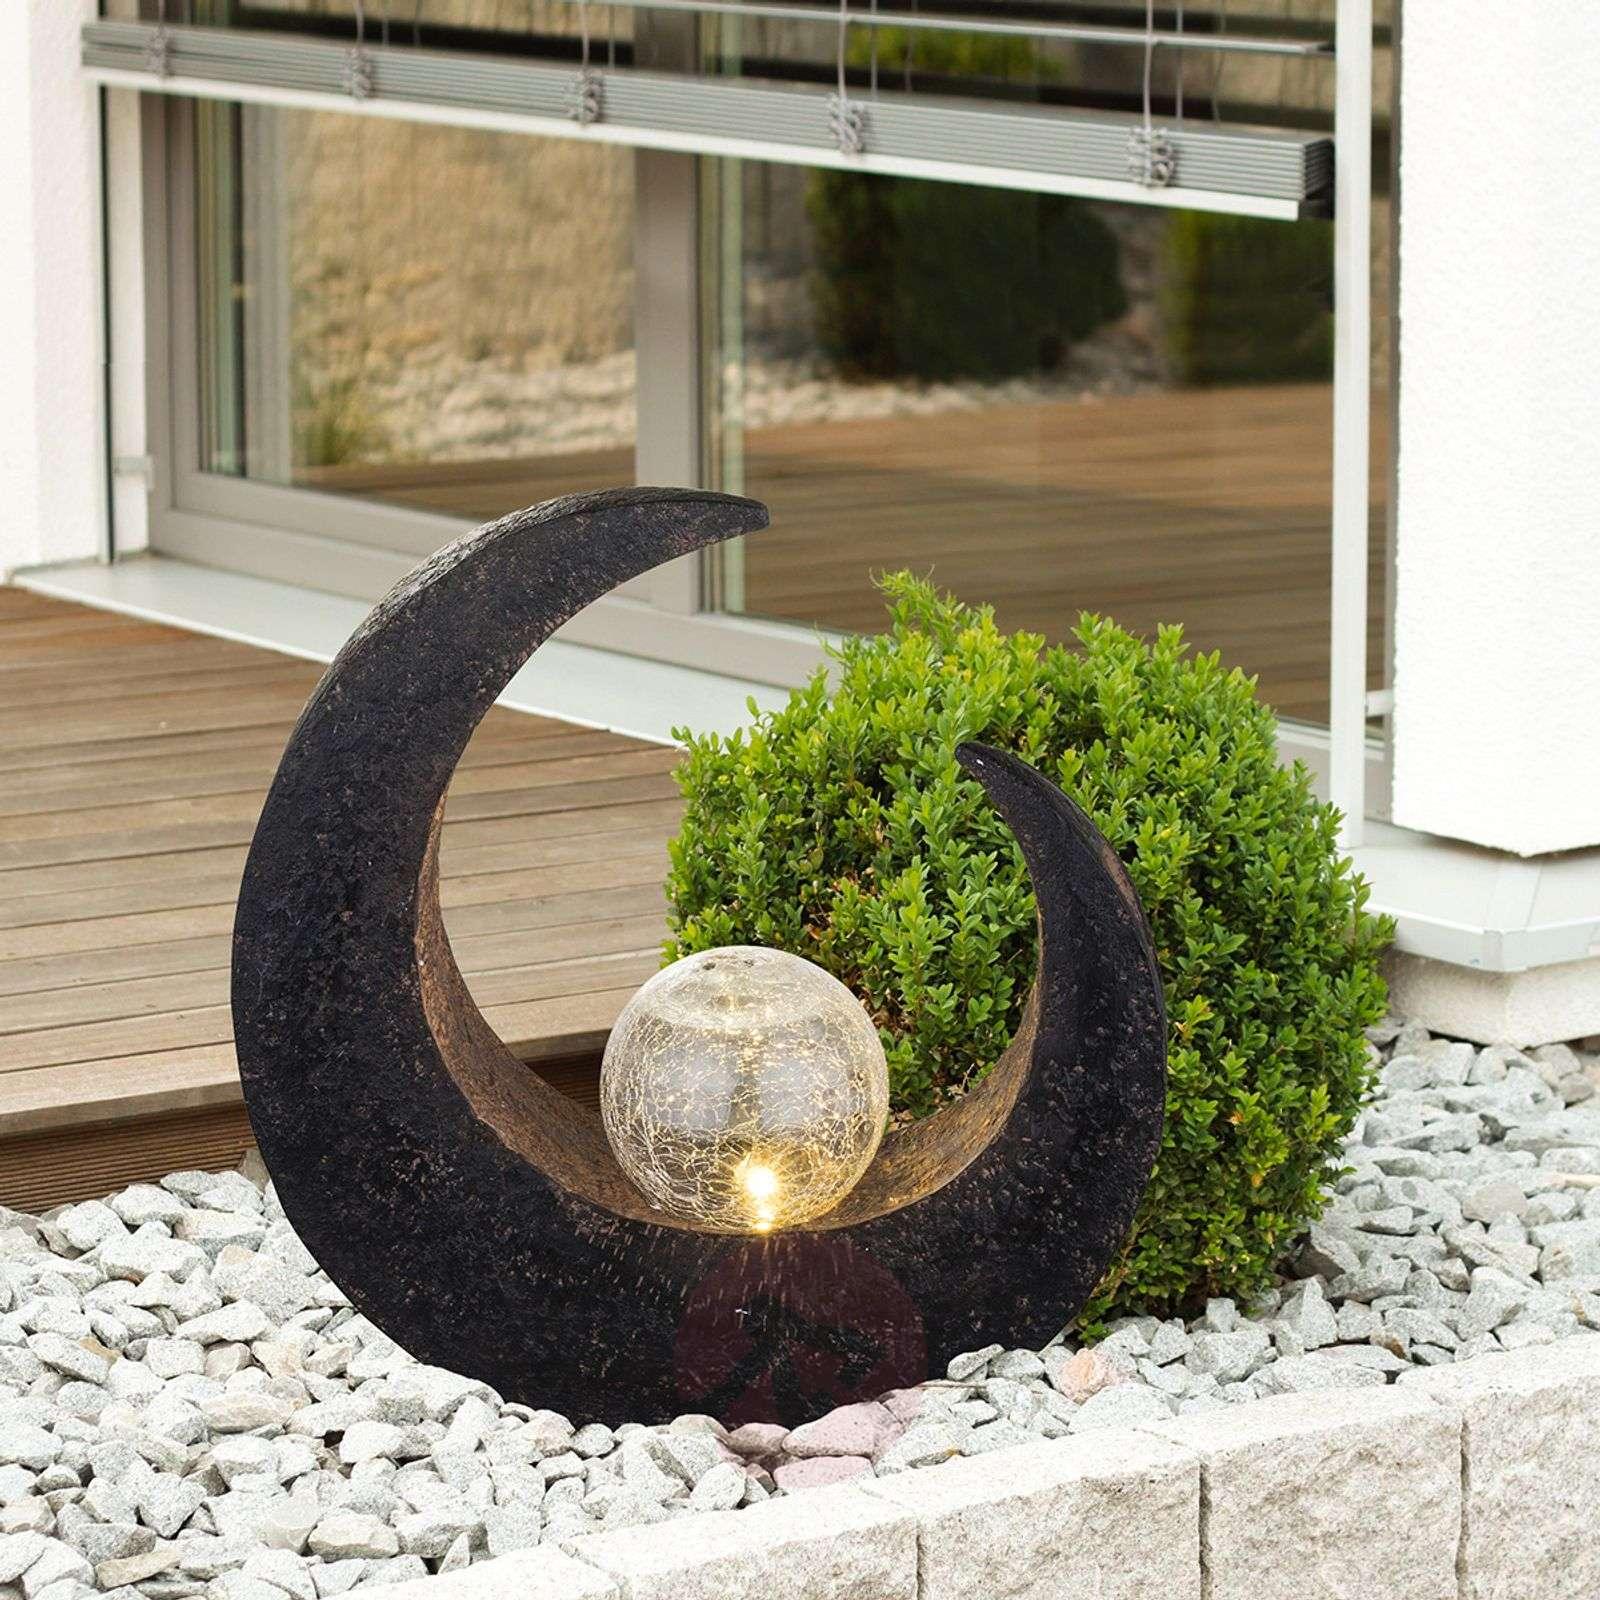 Outdoor decorative solar light Daiva-4014979-02